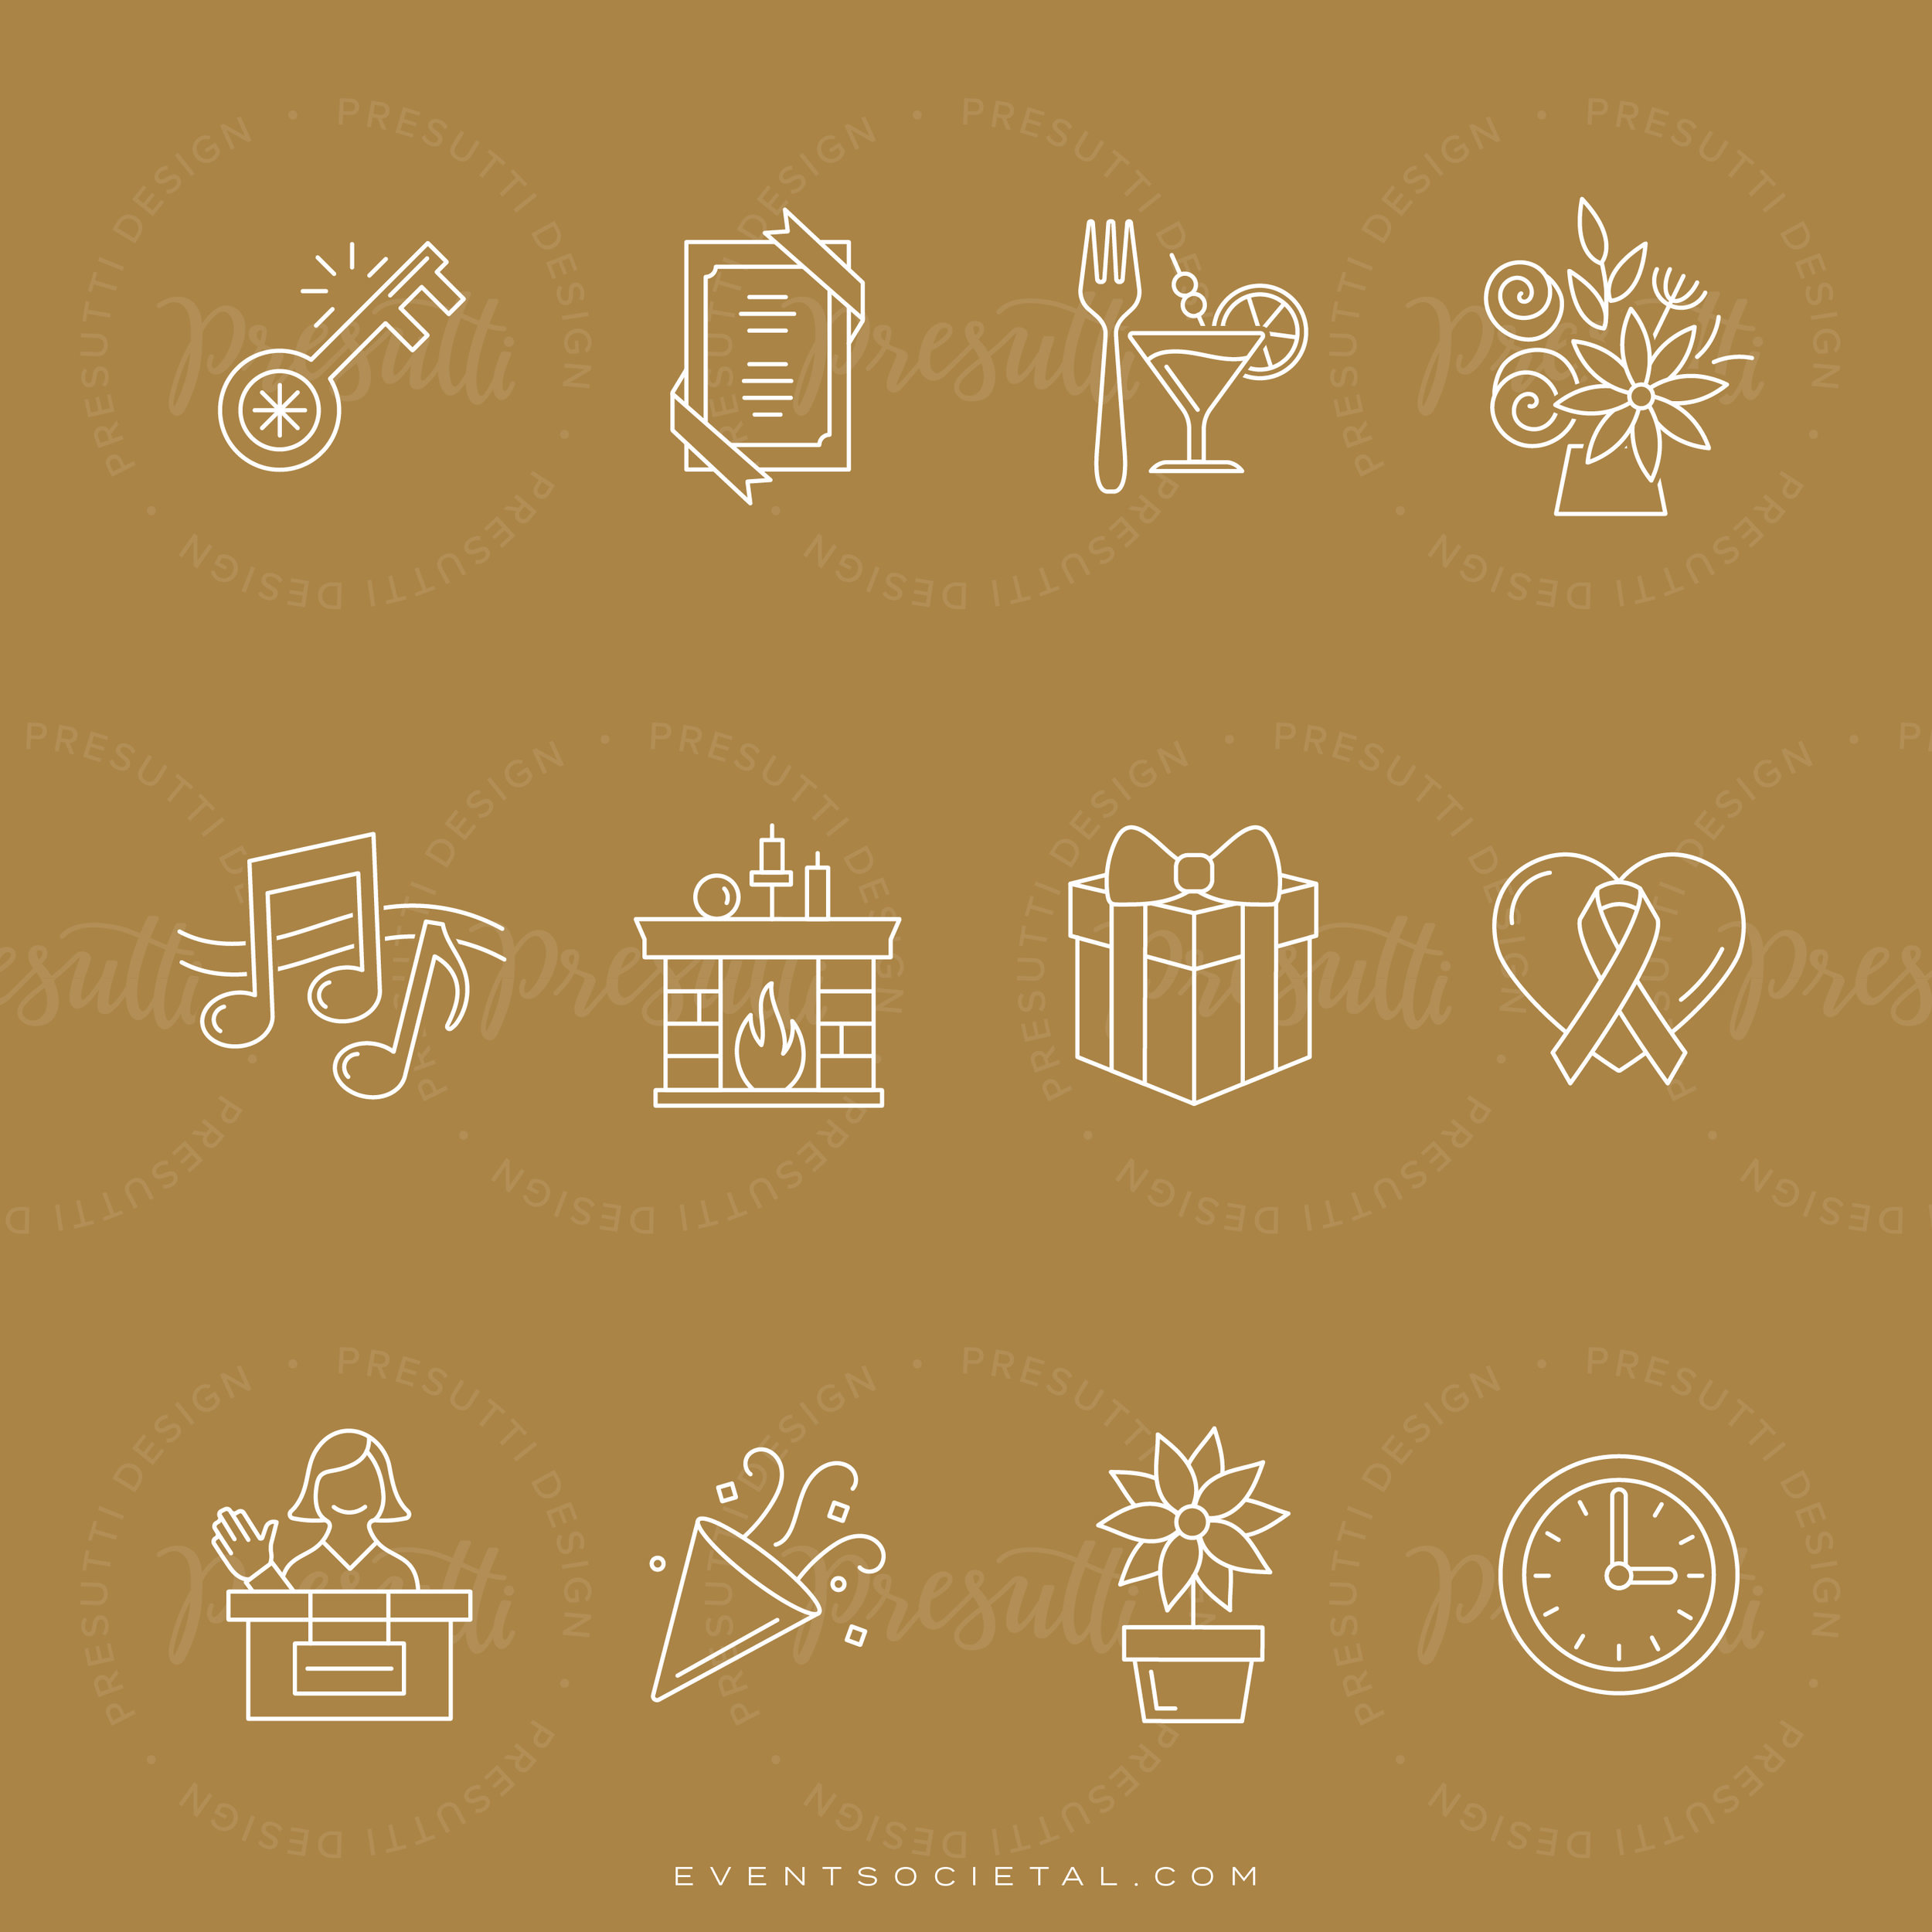 Presutti-Design-EventSocietal-Brand-Icons-Holiday-03.jpg